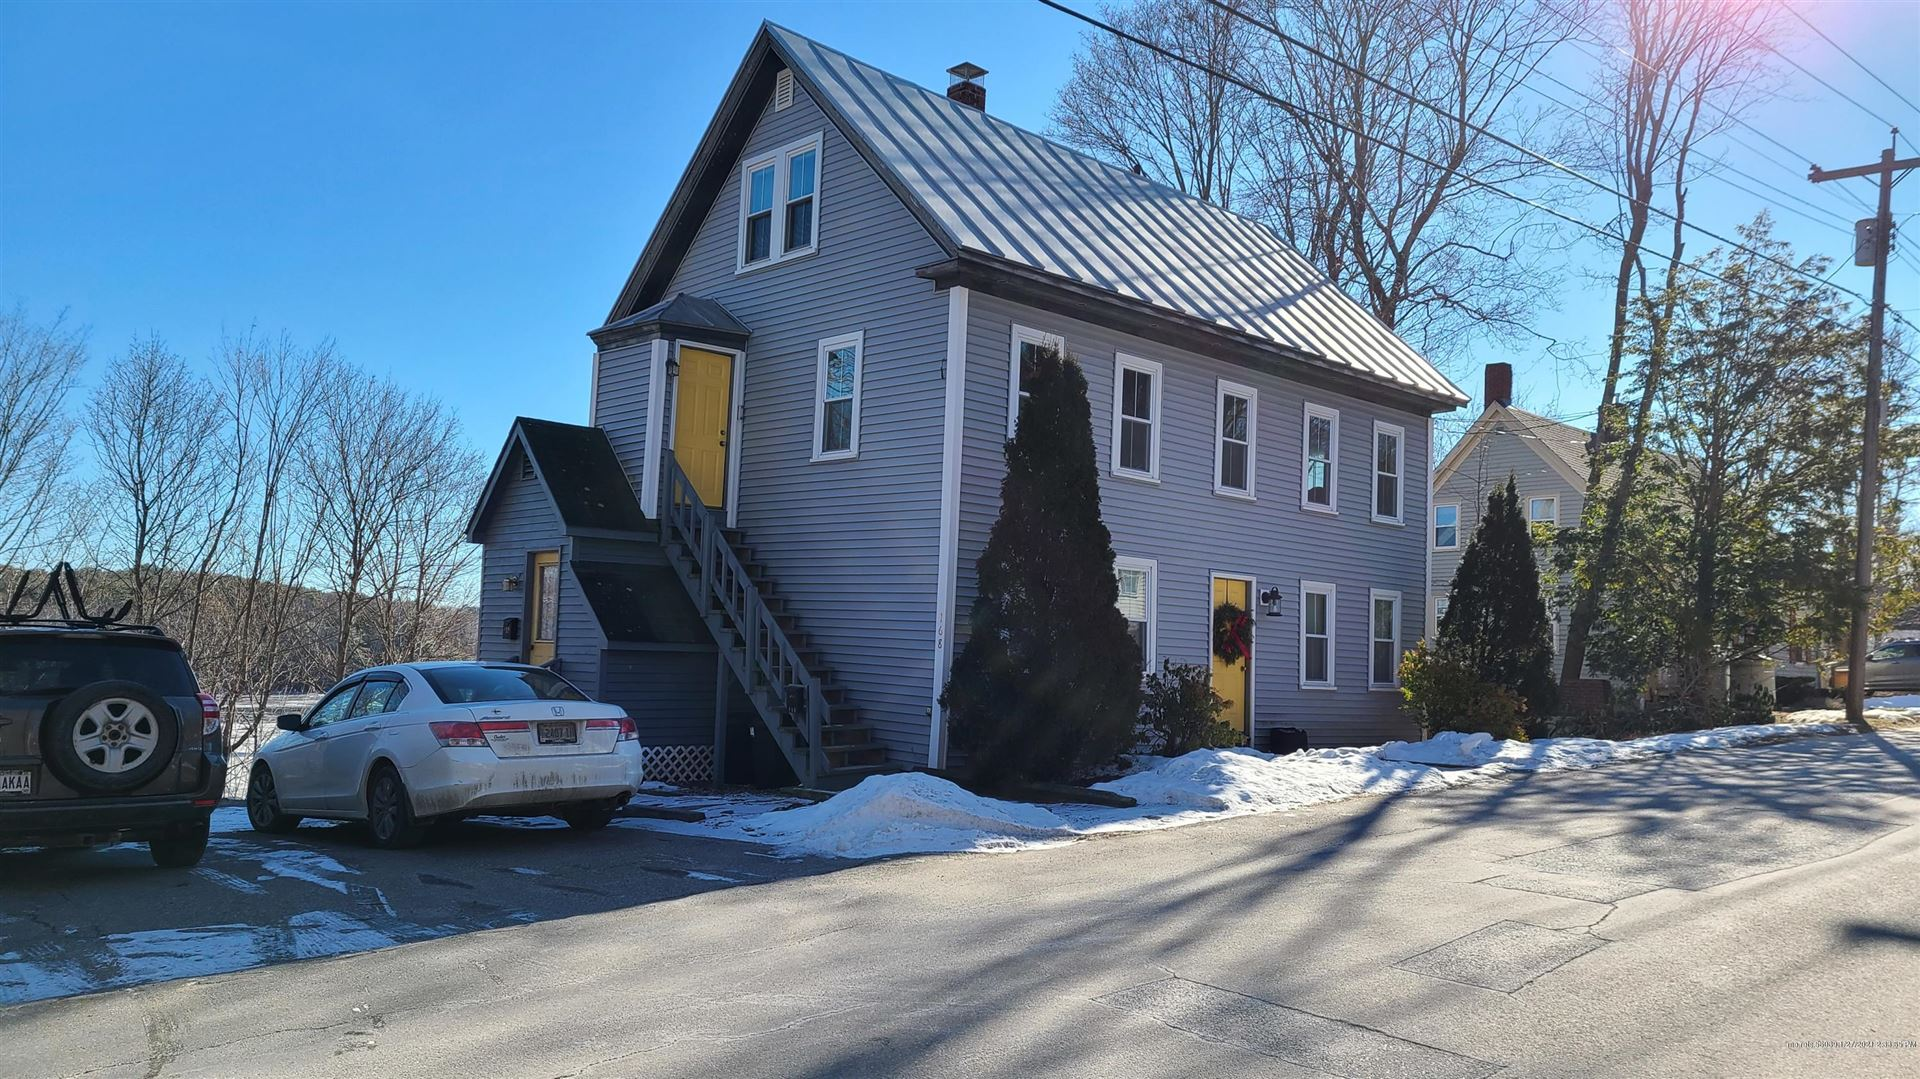 Photo of 168 Second Street, Hallowell, ME 04347 (MLS # 1480554)